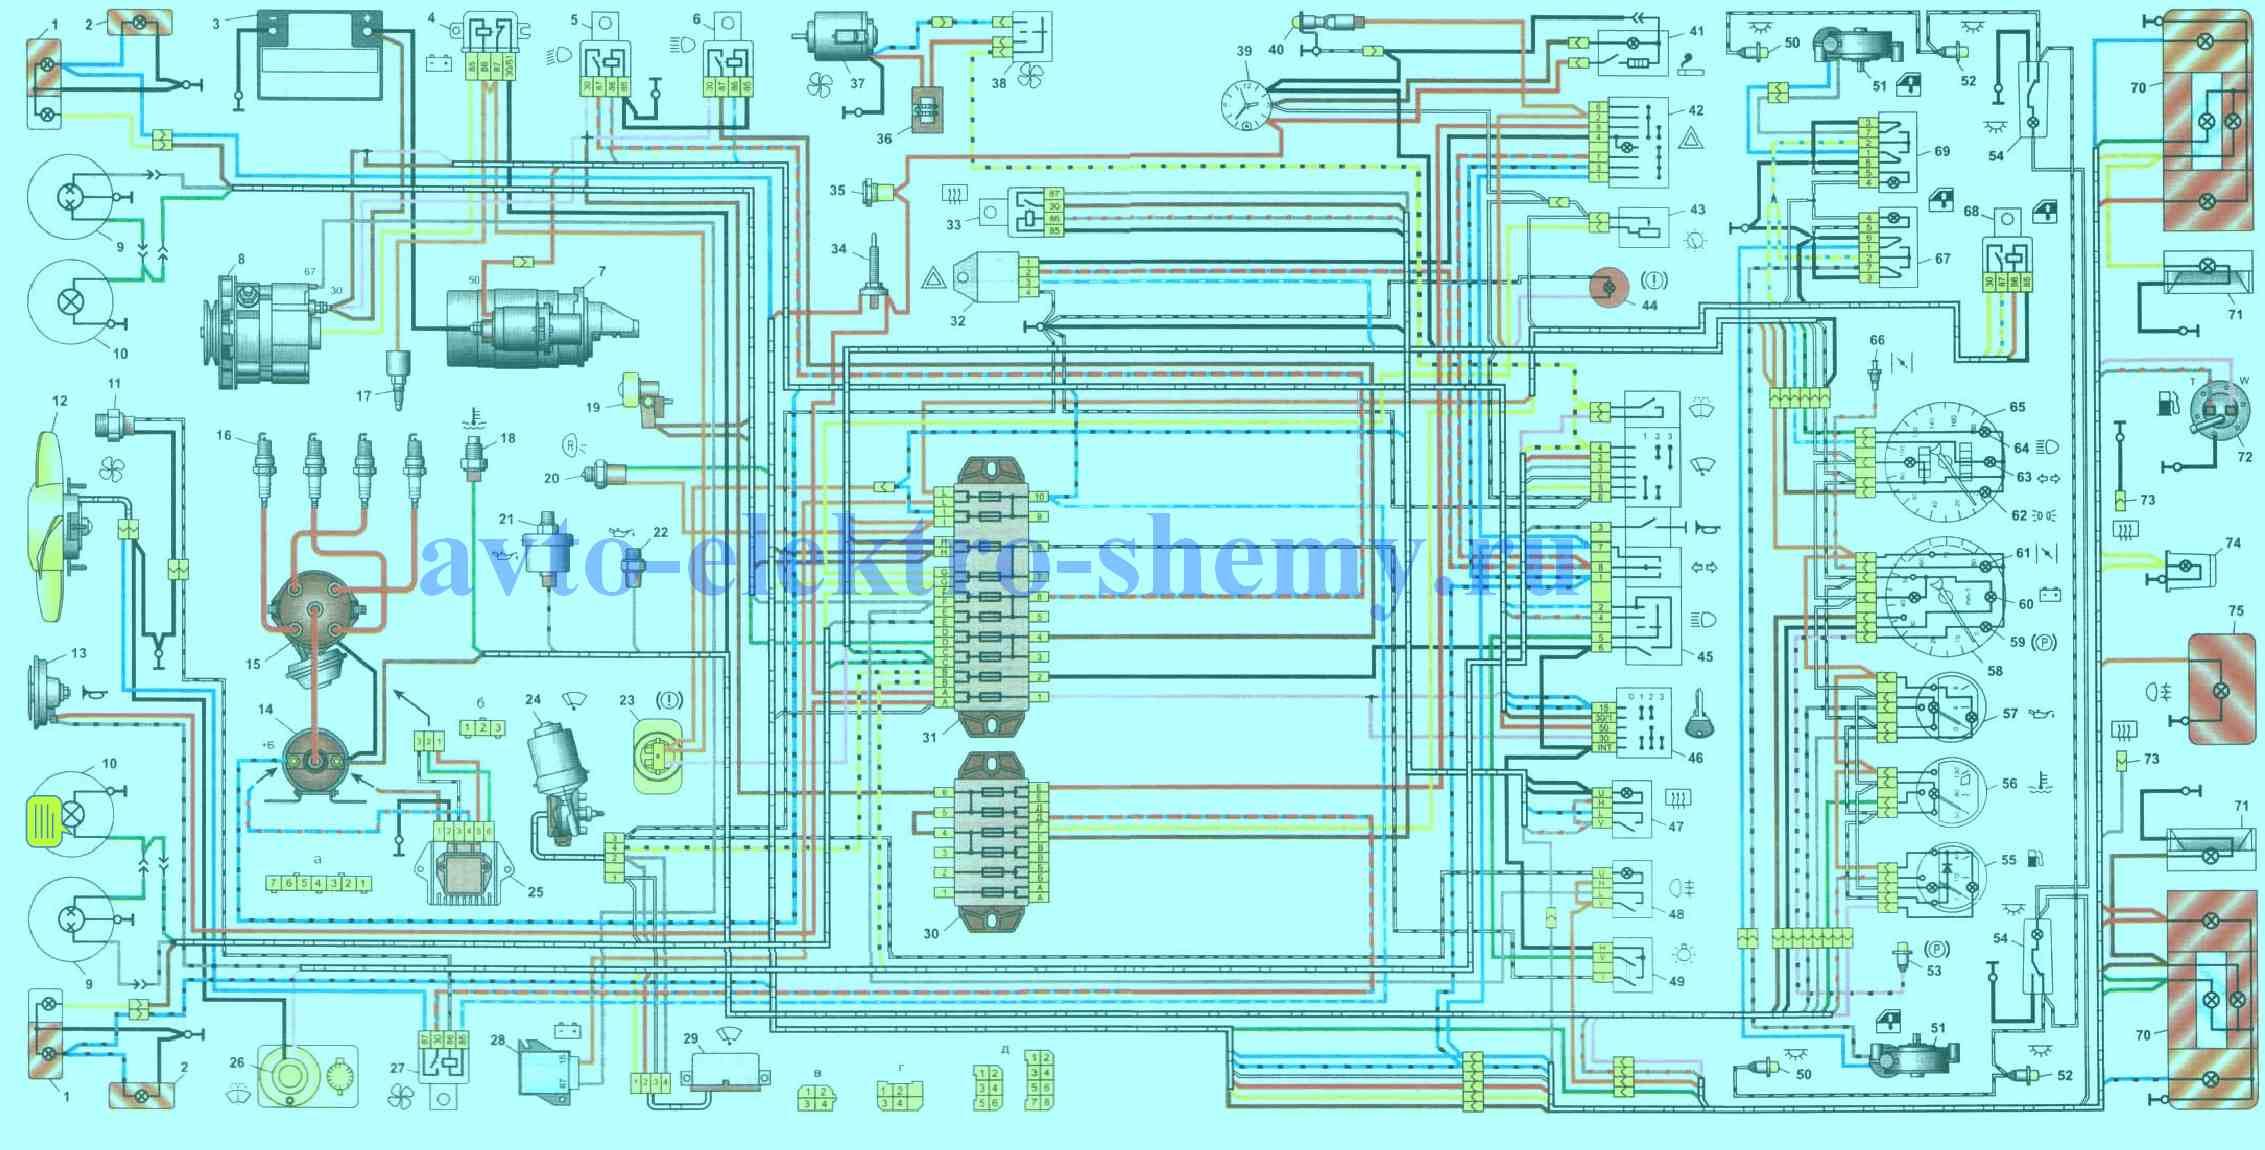 Схема электрооборудования автомобилей ВАЗ-2106_ВАЗ-21061_ВАЗ-21063_ВАЗ-21065 выпуска 1988-2001 гг.